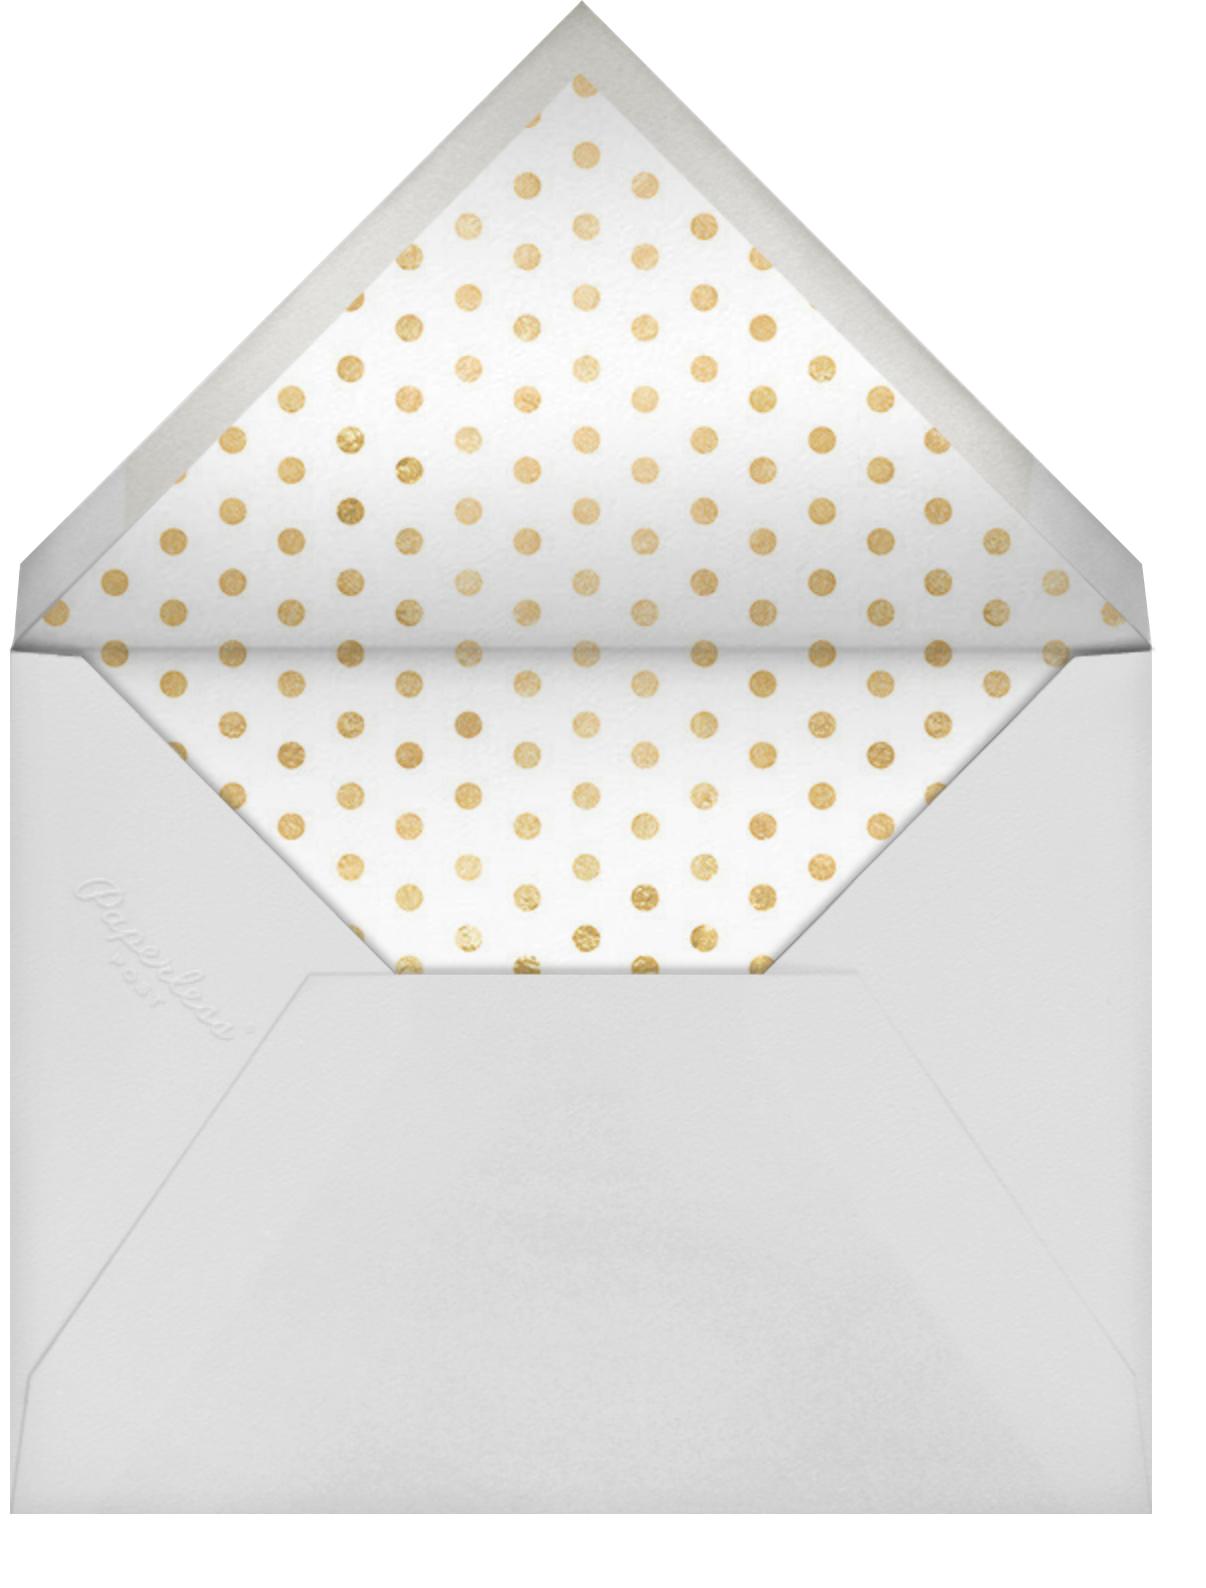 Layer Cake (Invitation) - Rifle Paper Co. - Adult birthday - envelope back